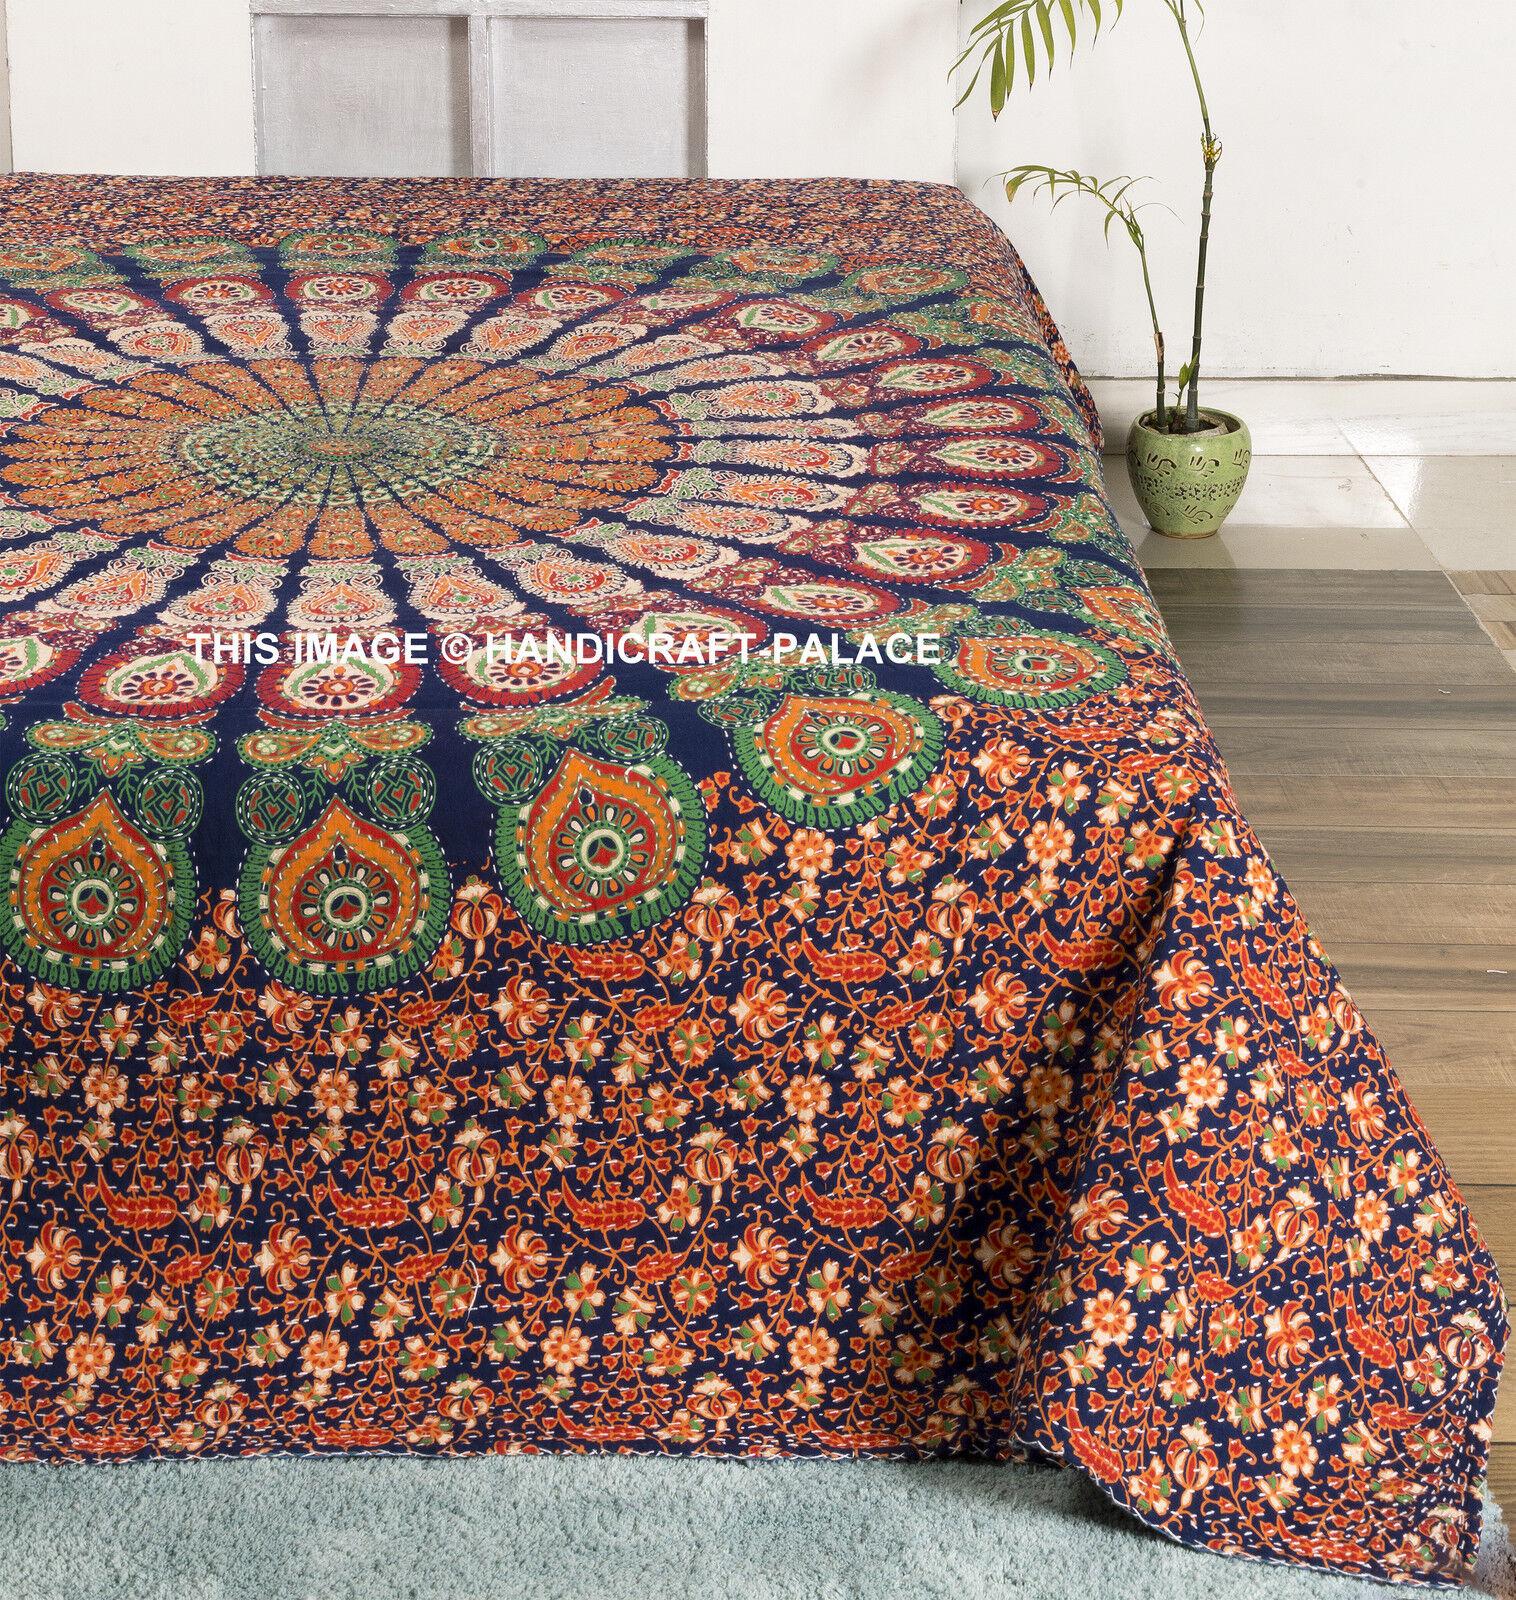 Designer Mandala Kantha`QuiltIndian Queen Bedspread Throw Cotton Blanket Gudari